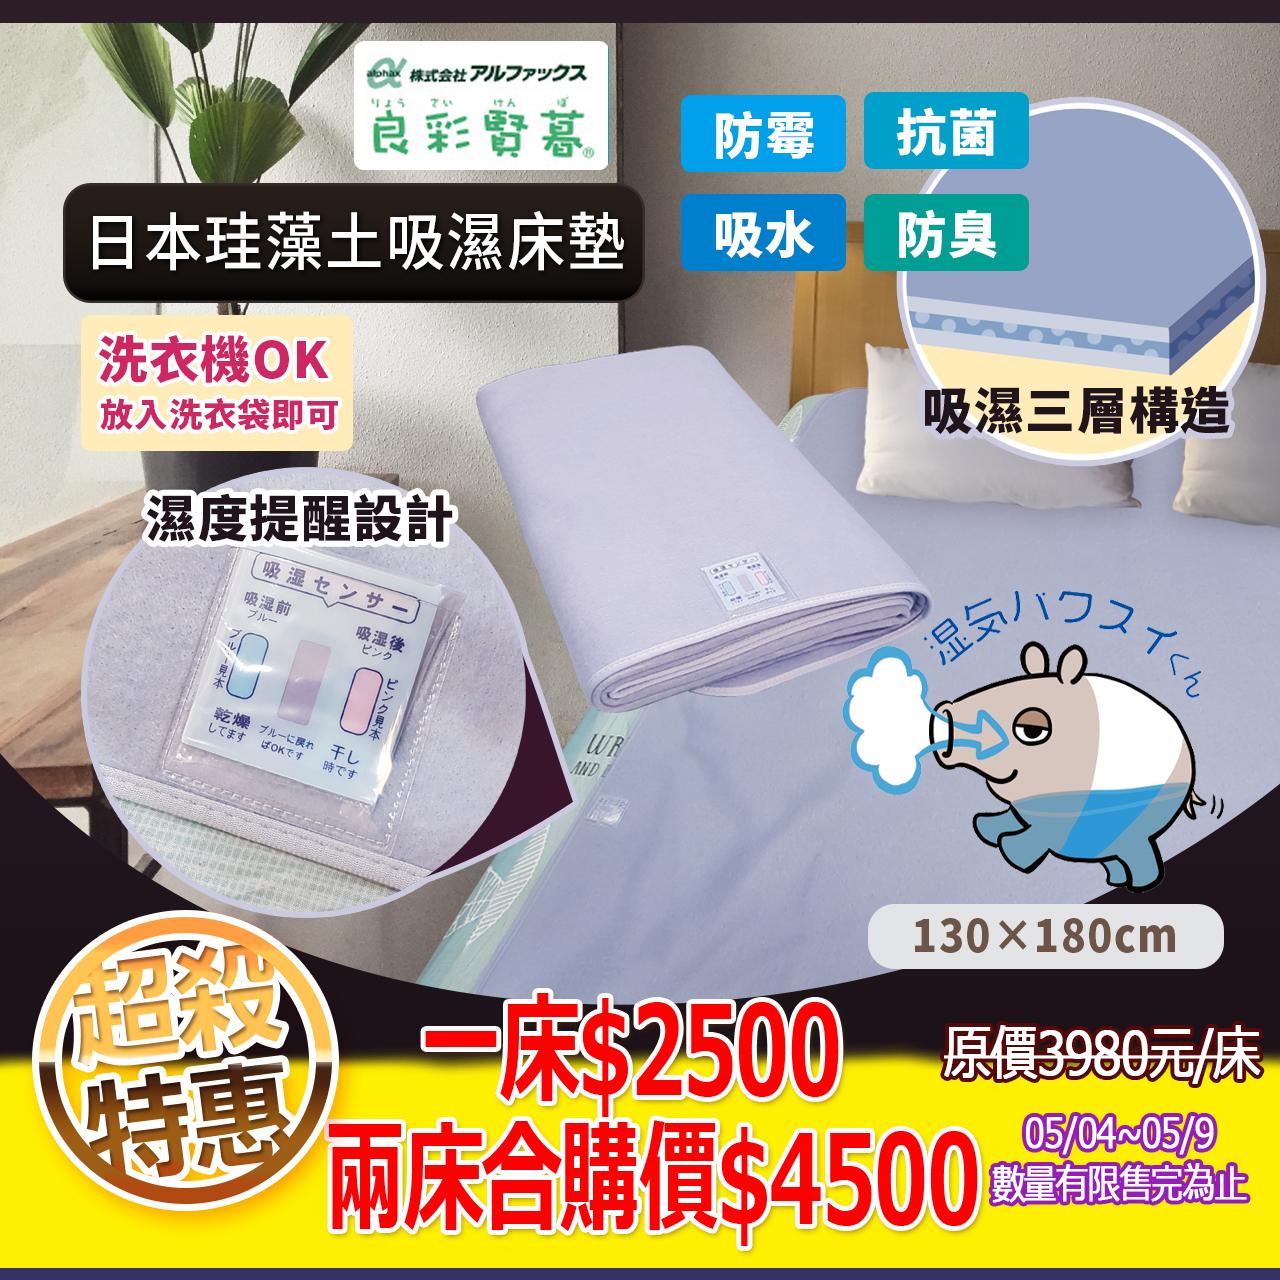 《HOYA-Life日本生活館》日本 良彩賢暮 珪藻土吸濕床墊 B型矽膠 除臭 防霉 內墊